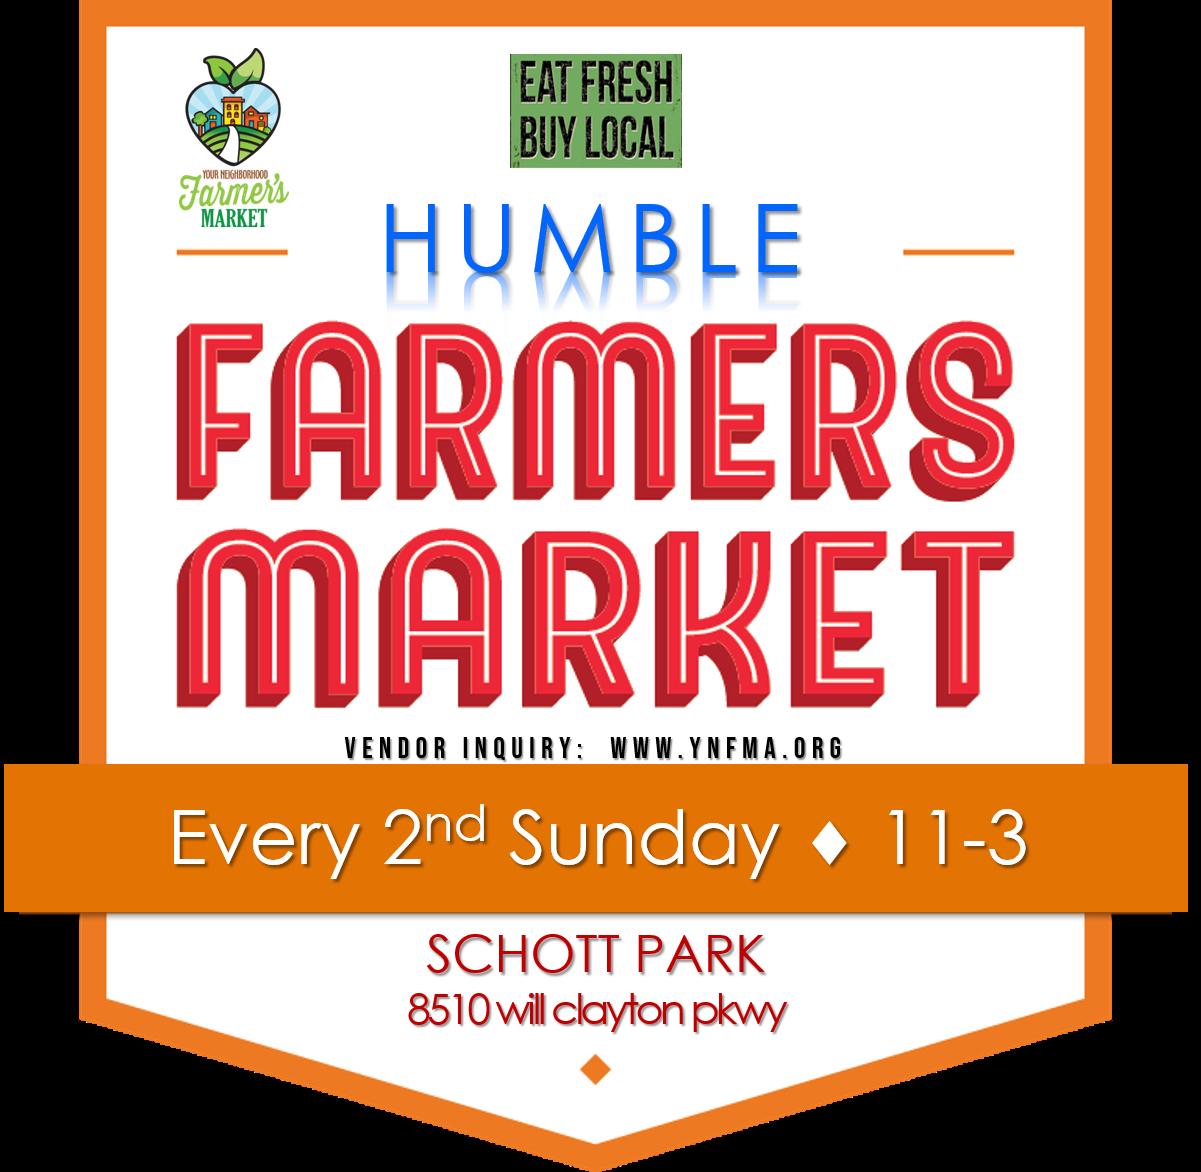 HUMBLE FARMER'S MARKET